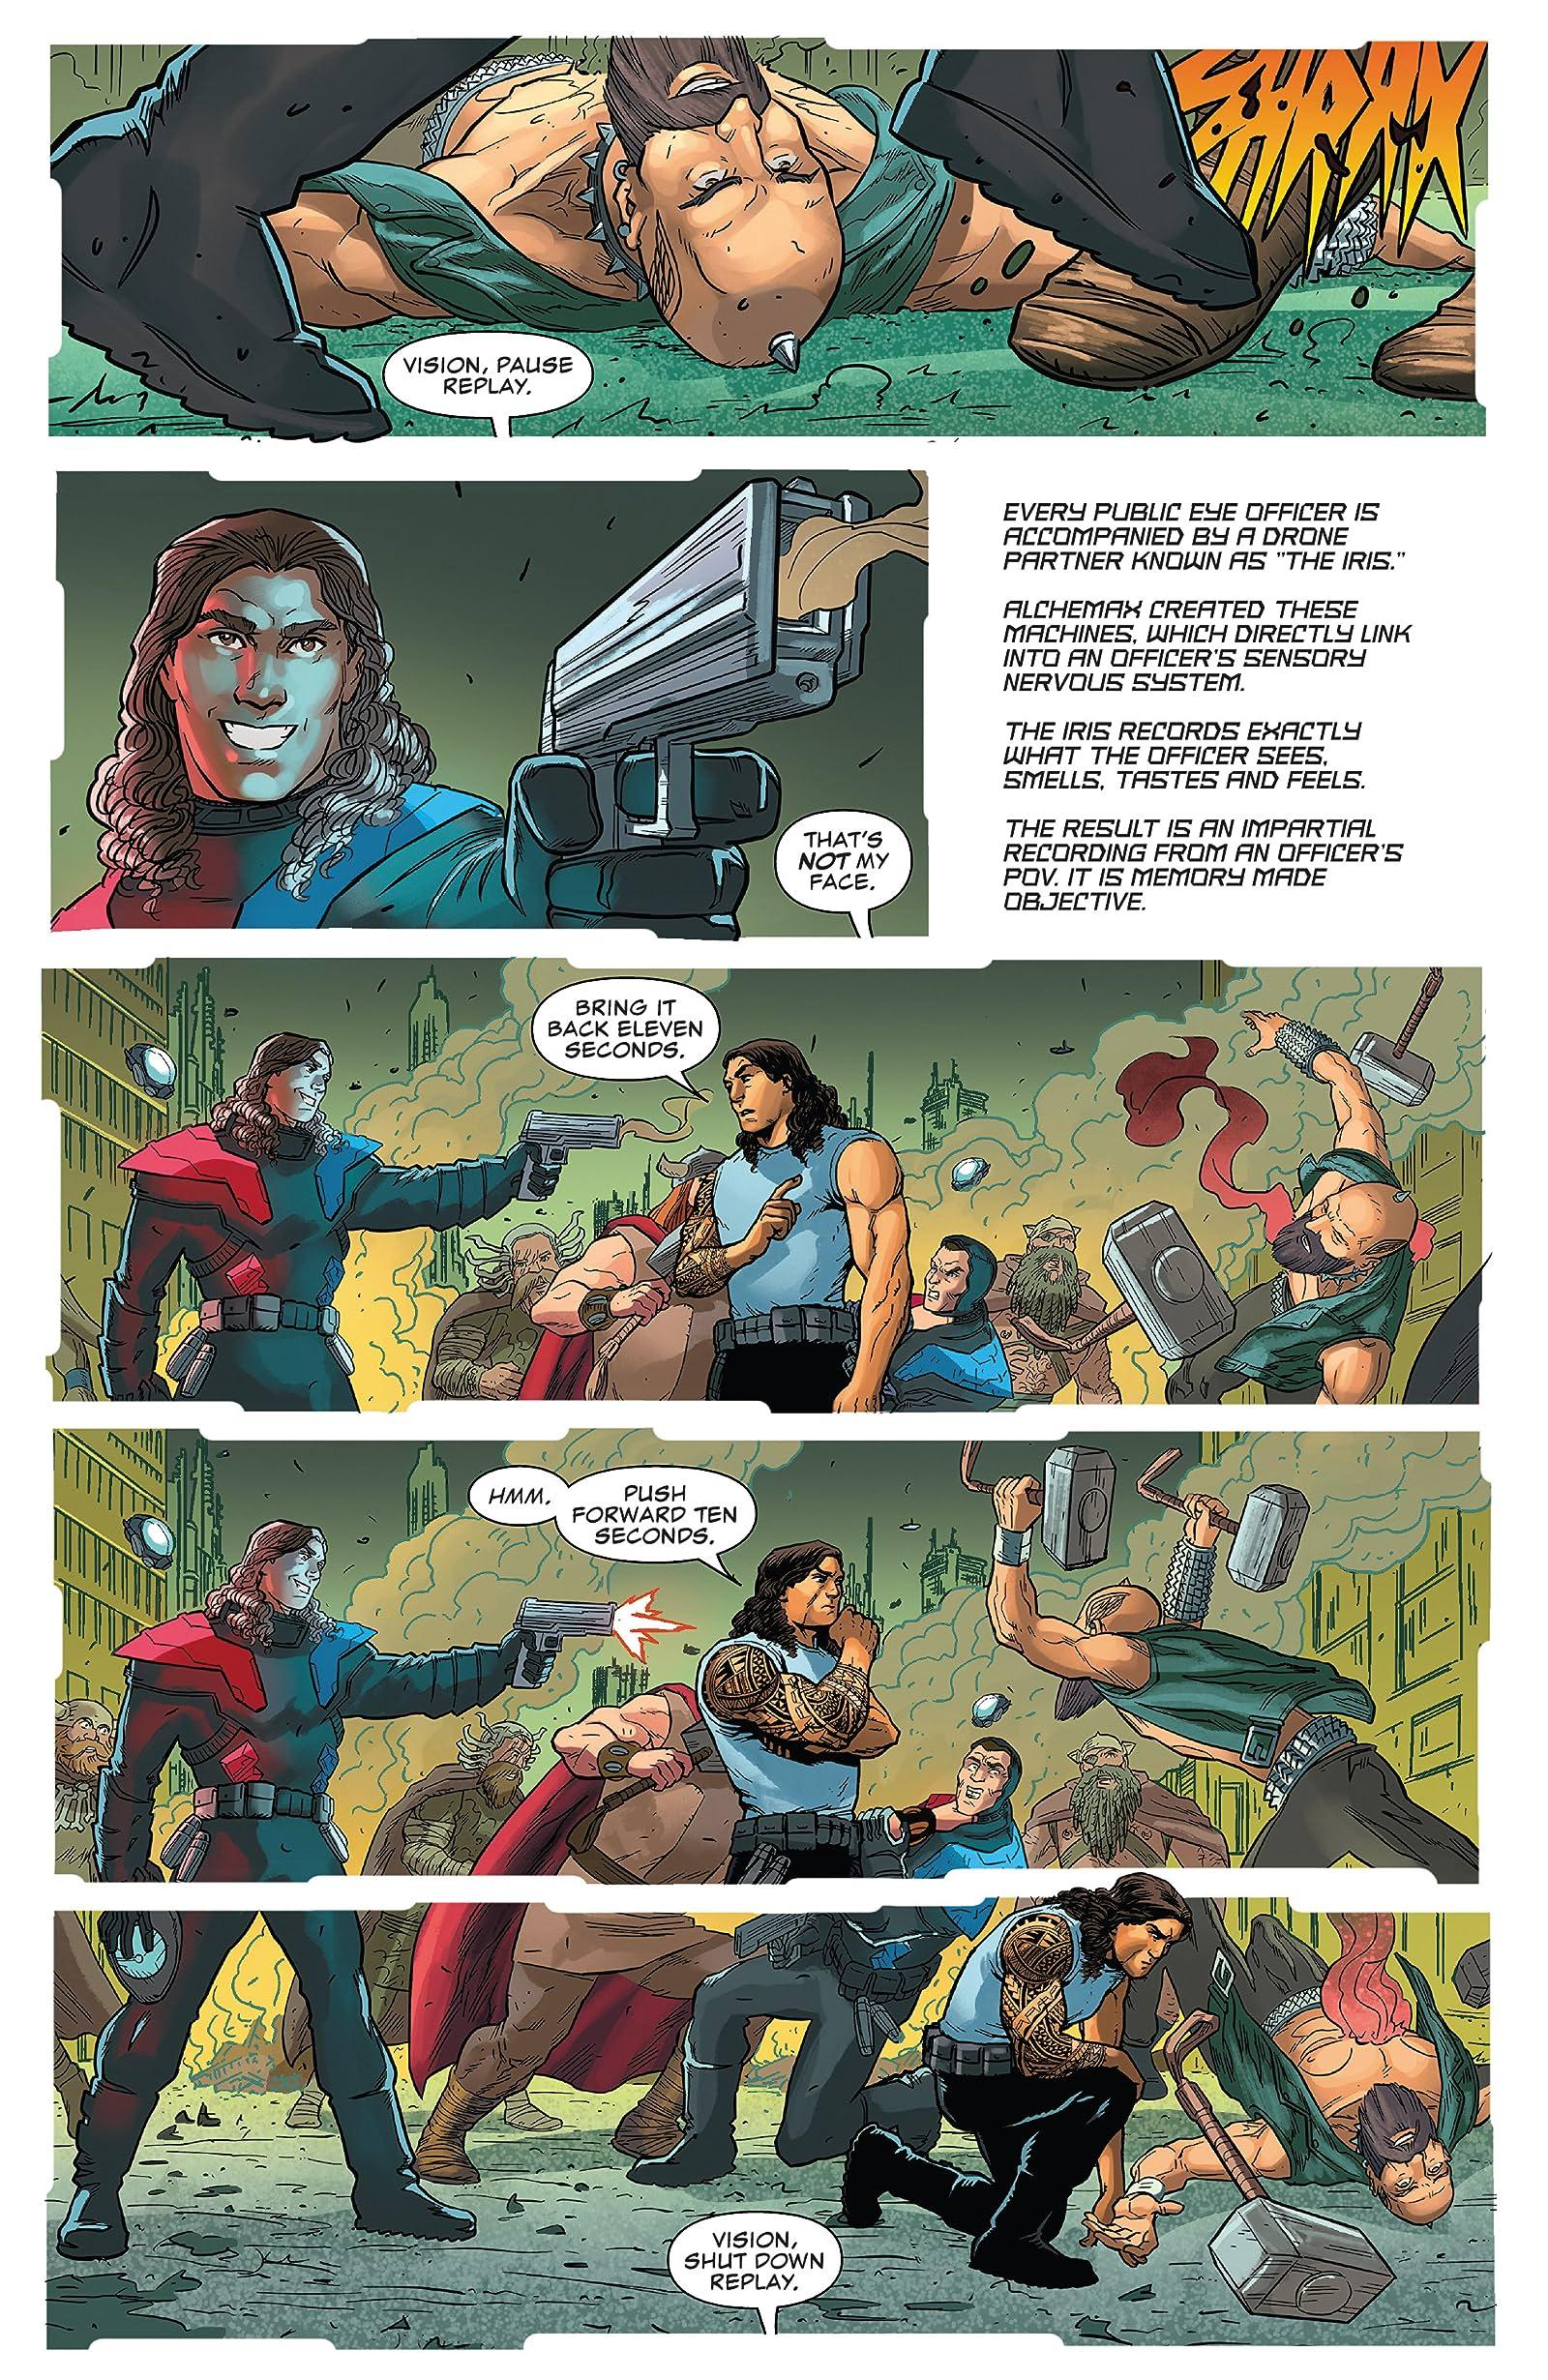 Punisher 2099 #1Select Main /& Variant CoversMarvel Comics NM 2019